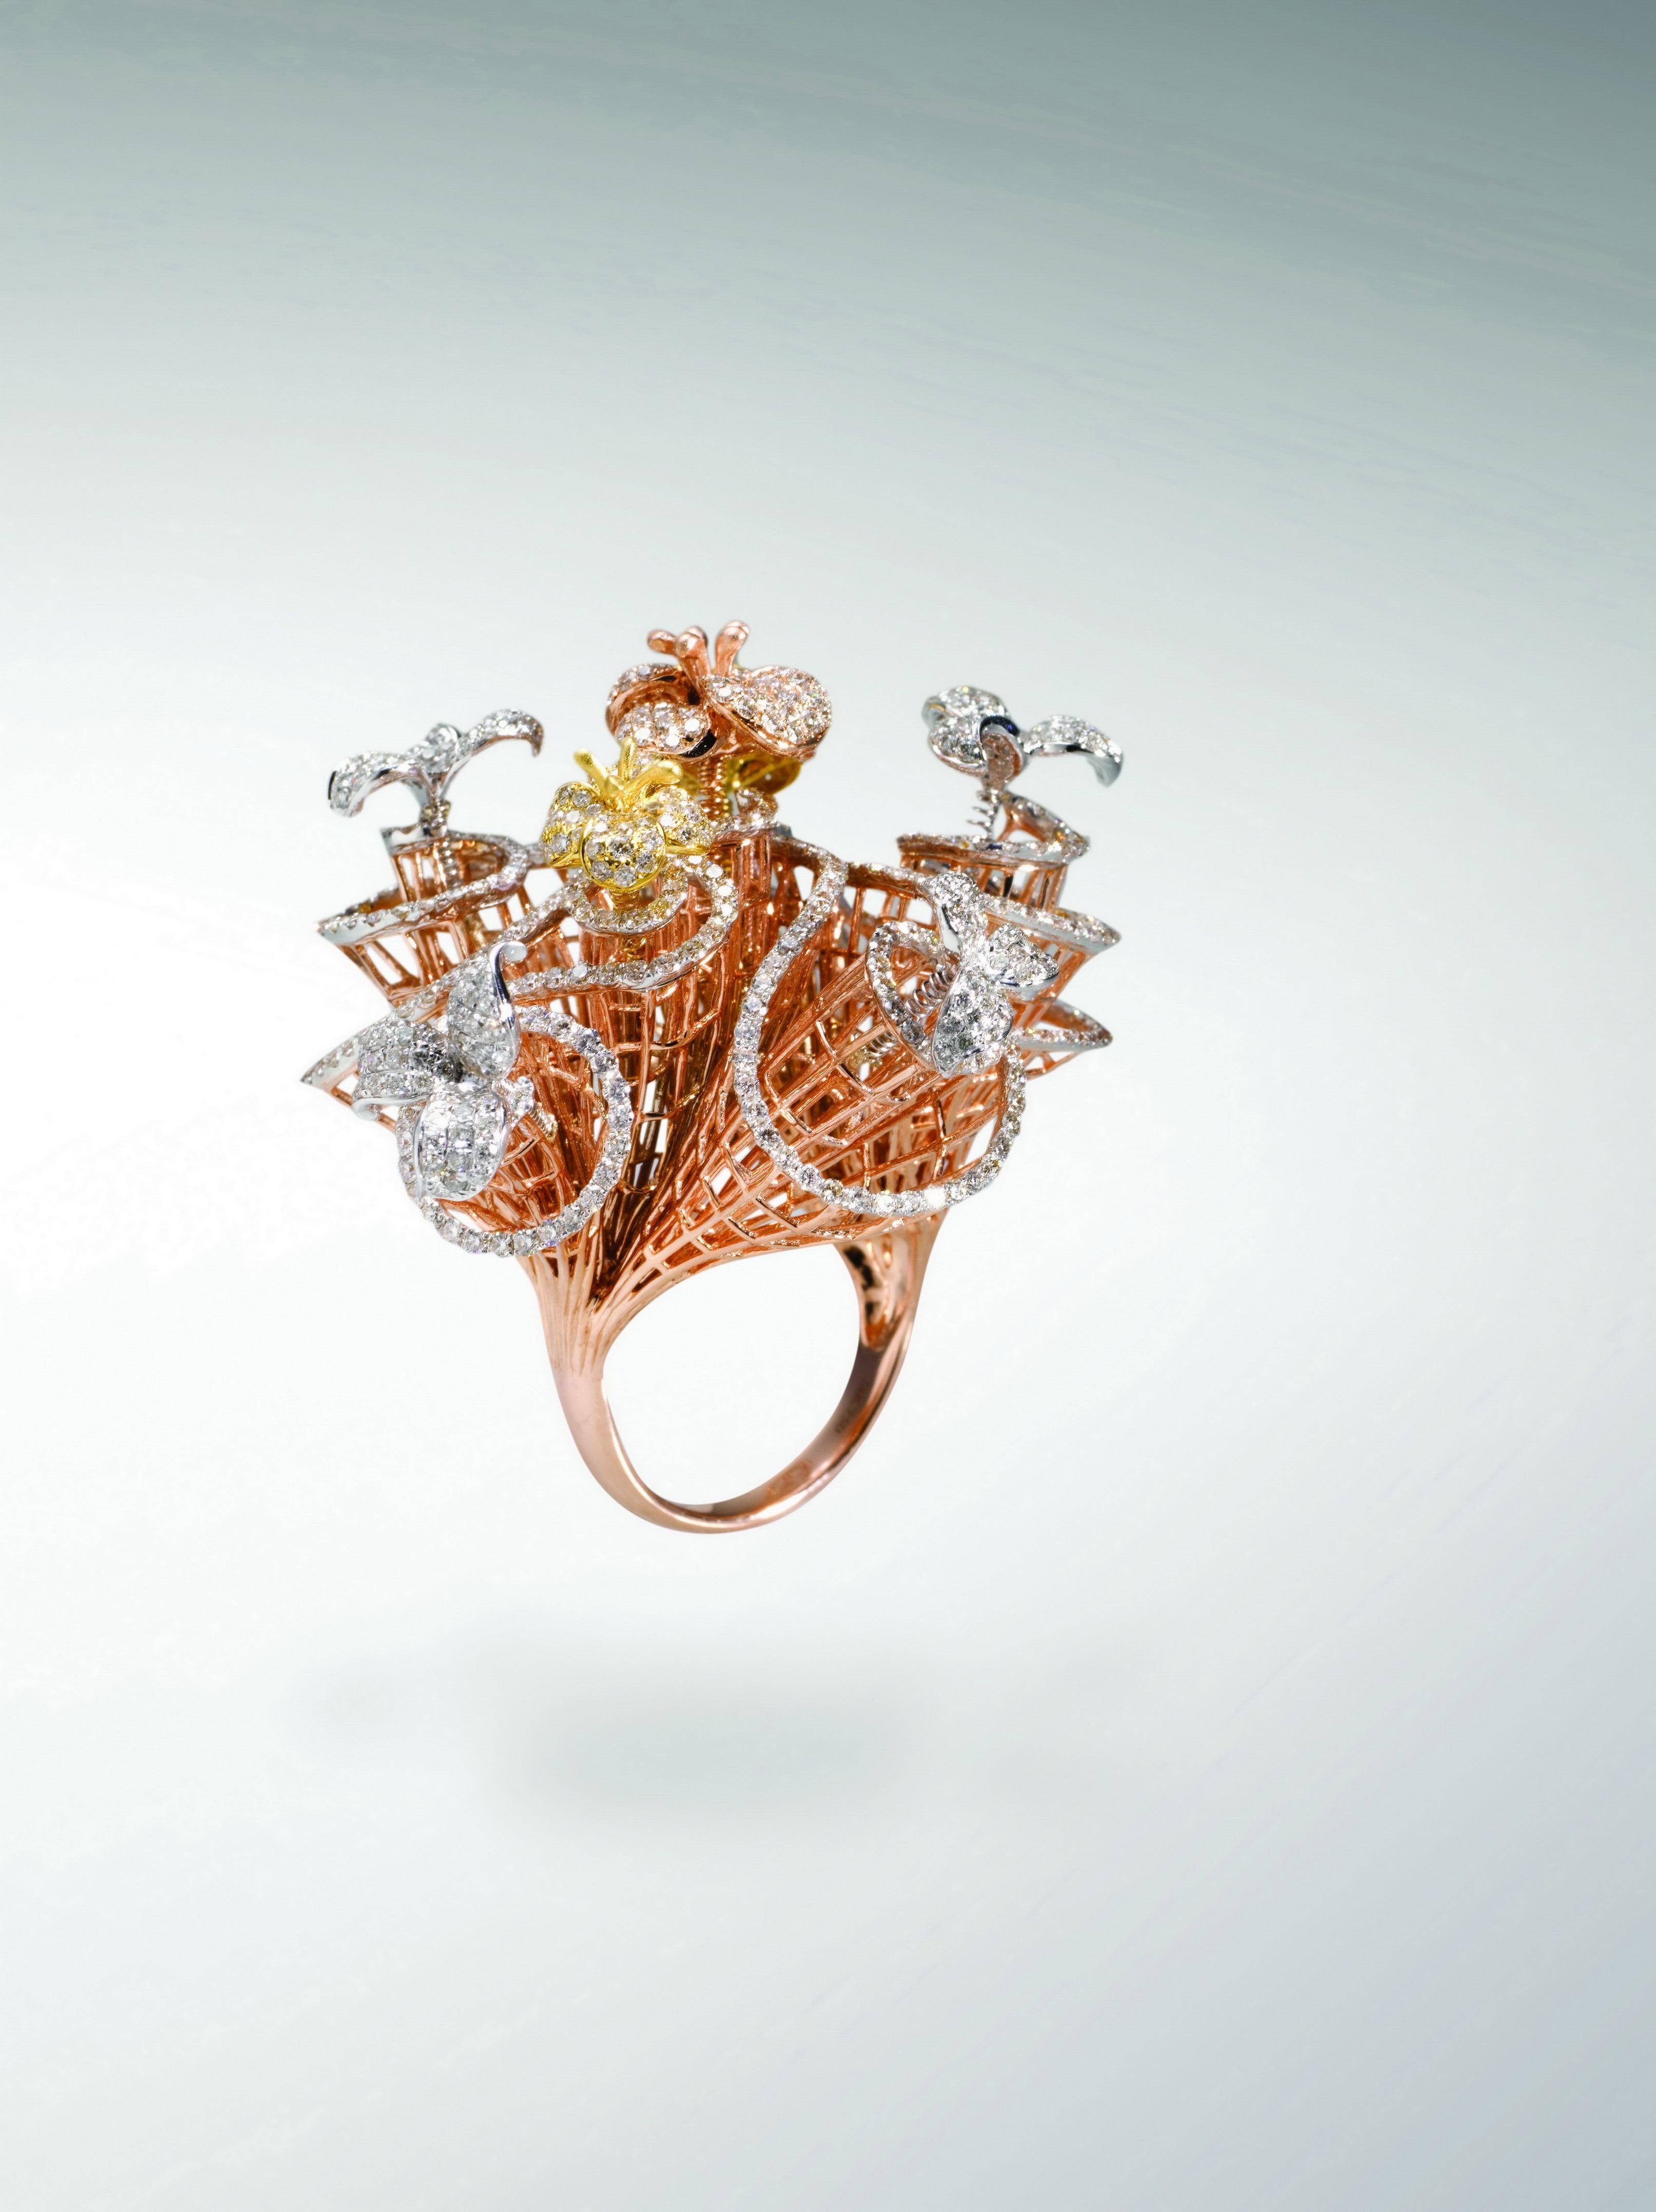 hktdccom Jewellery Design Competition Winners AnnouncedbrHong